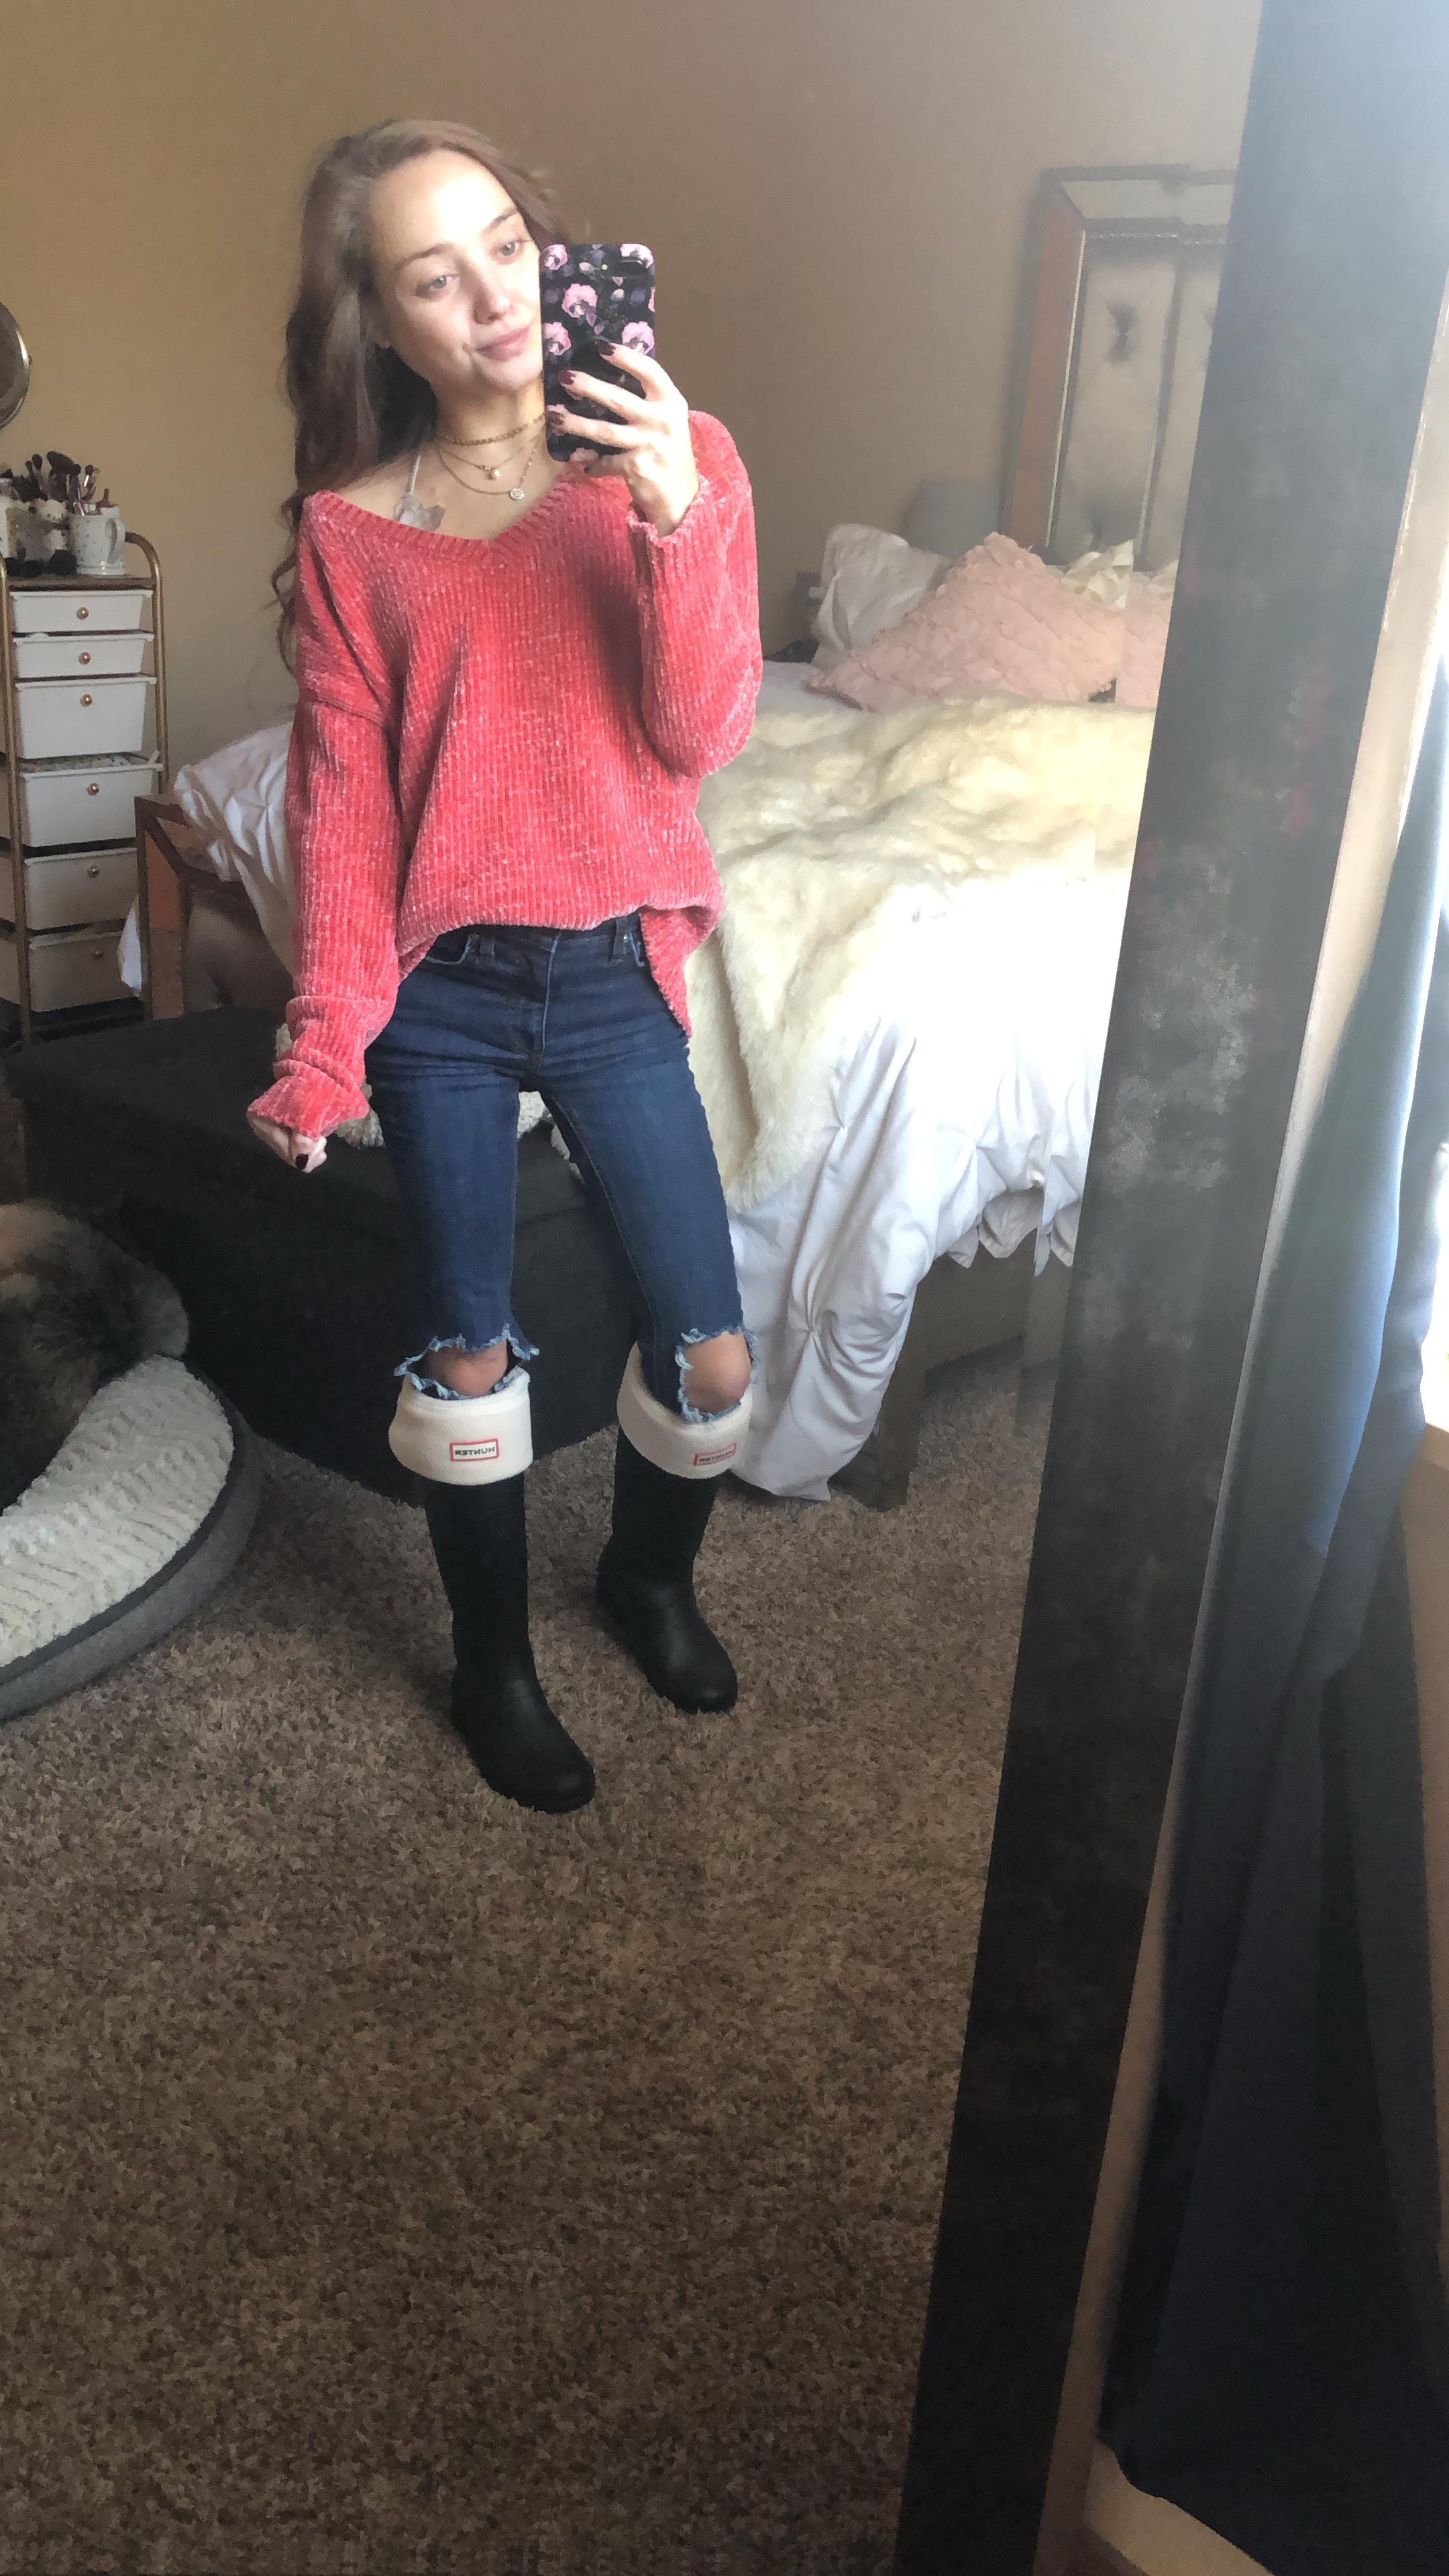 sweater (sold out-  similar here ) //  bralette  //  hunter rainboots  //  rainboot socks //  duckboots  (sale- use code BIG) //  jeans  -  SALE HERE CODE:BIG)